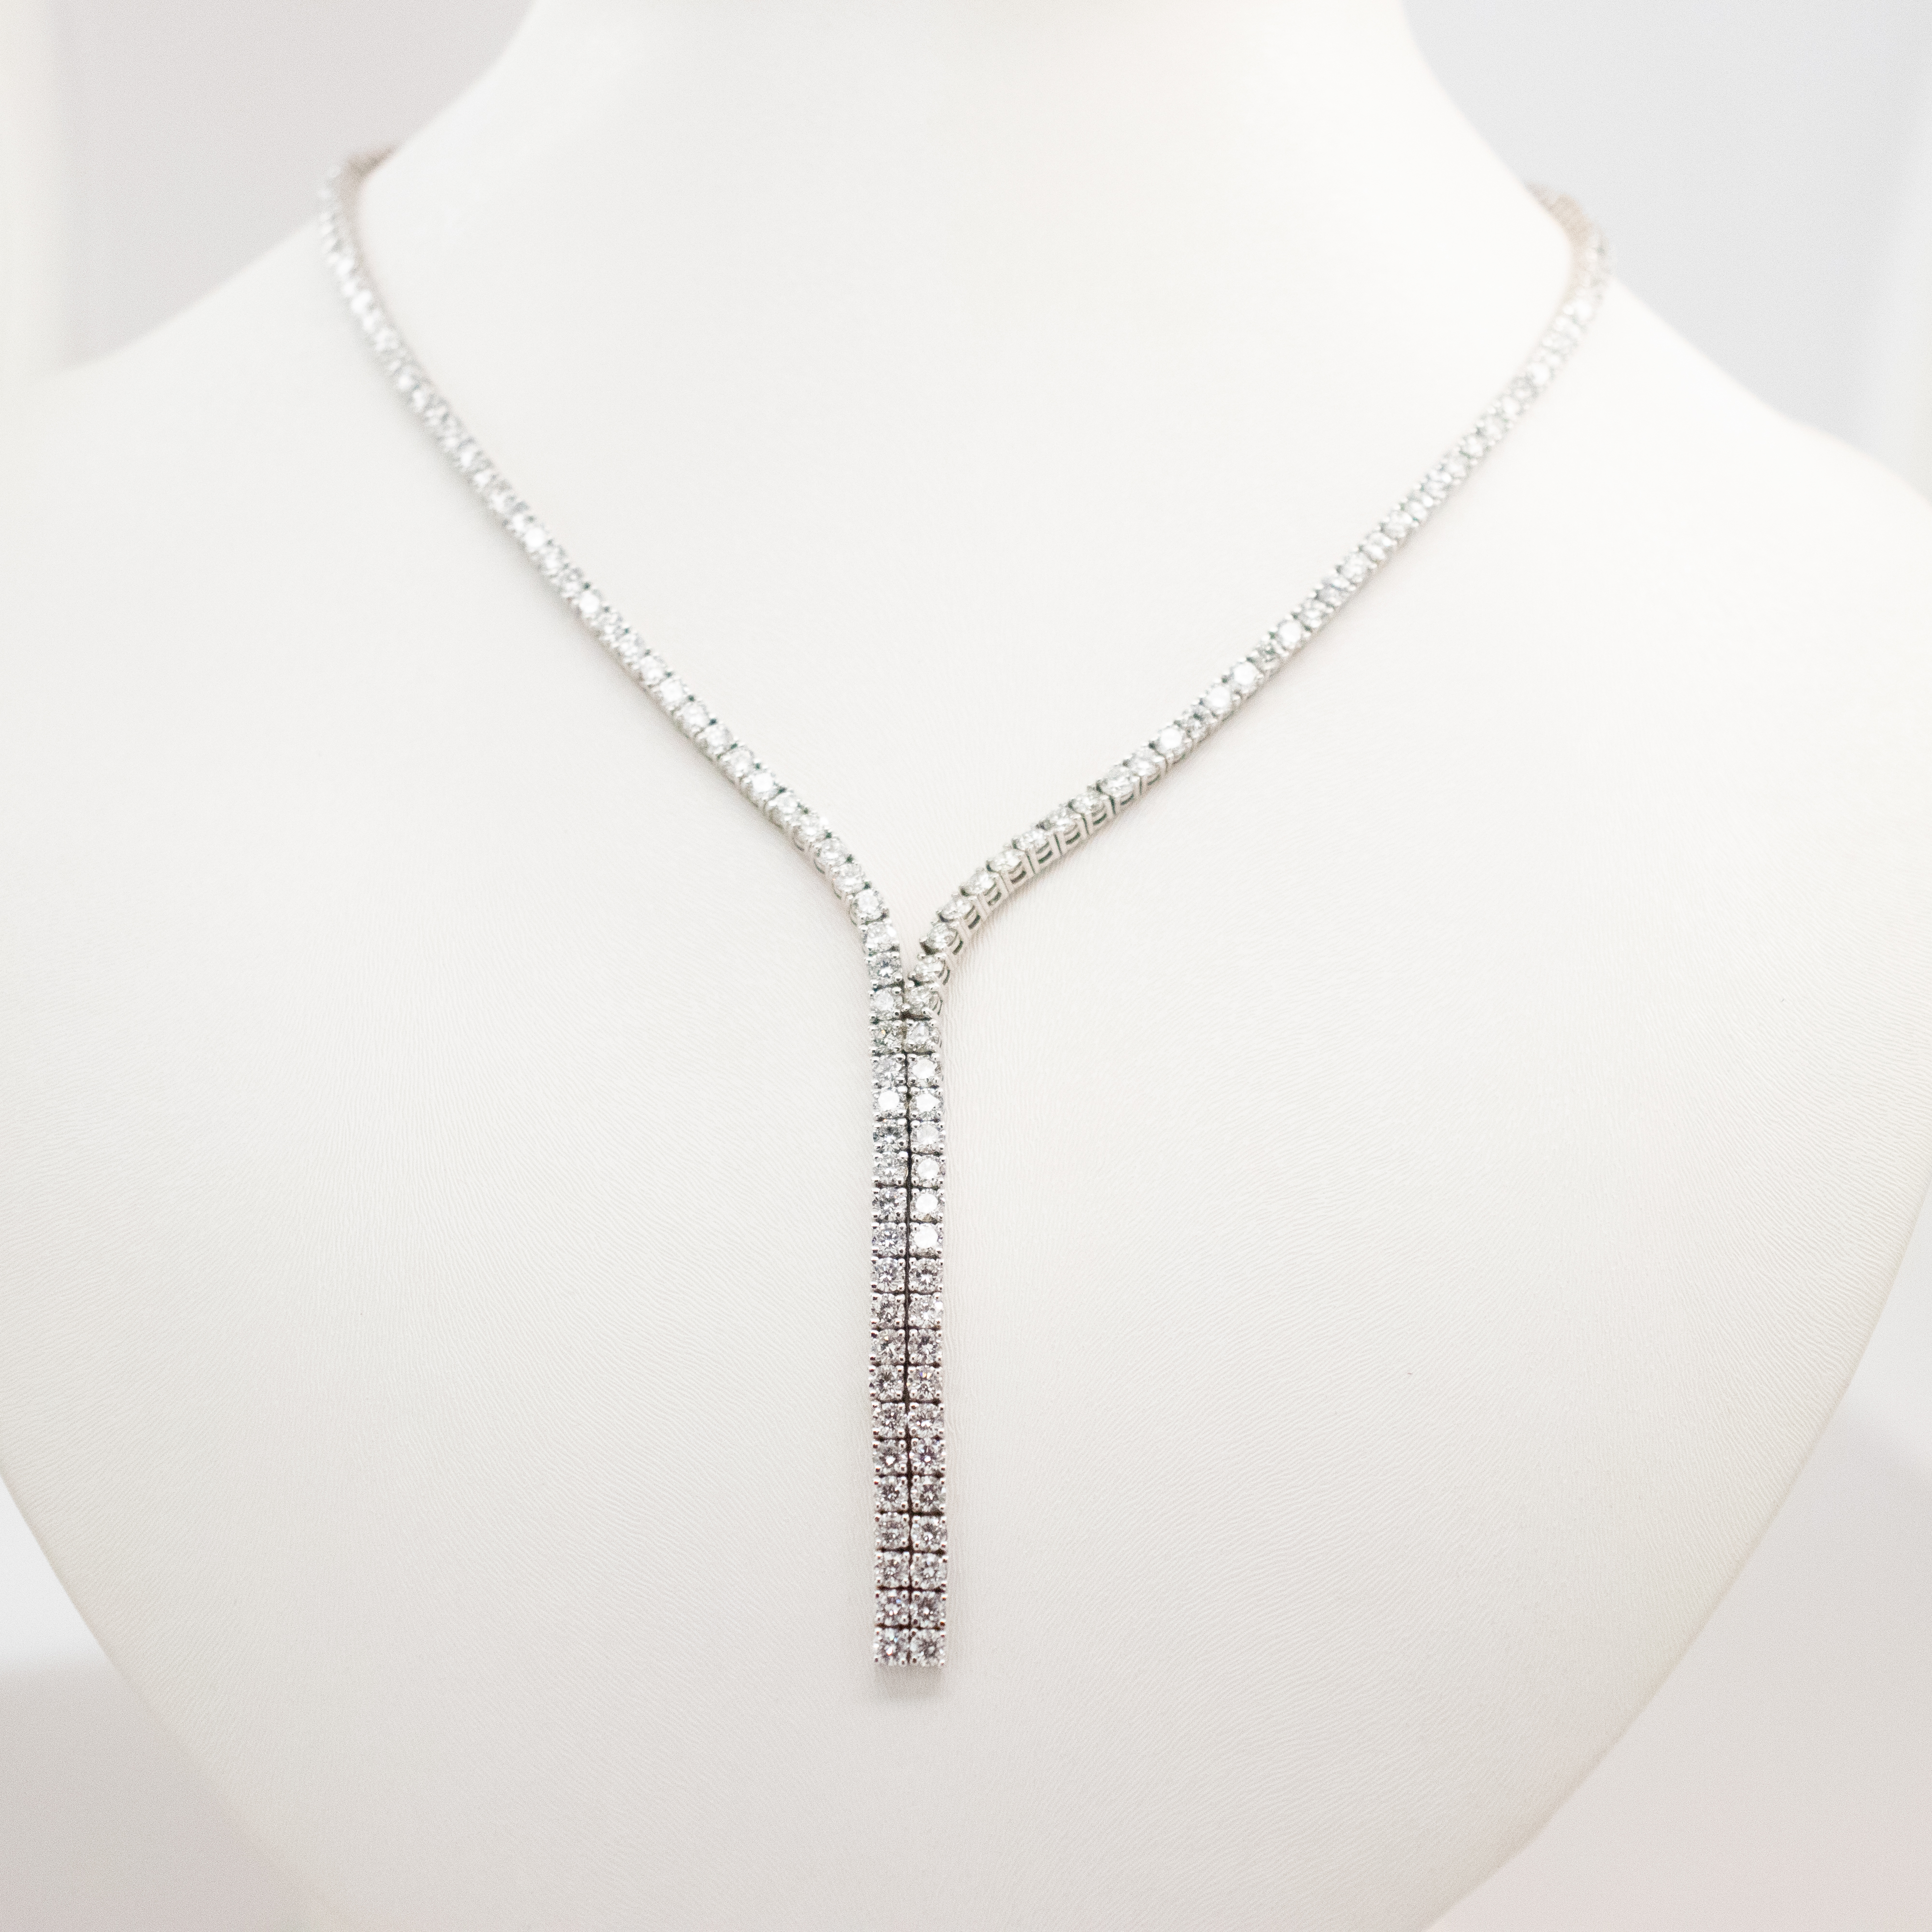 Diamond Eternity Necklace, 19.21 CTW, 14k White Gold